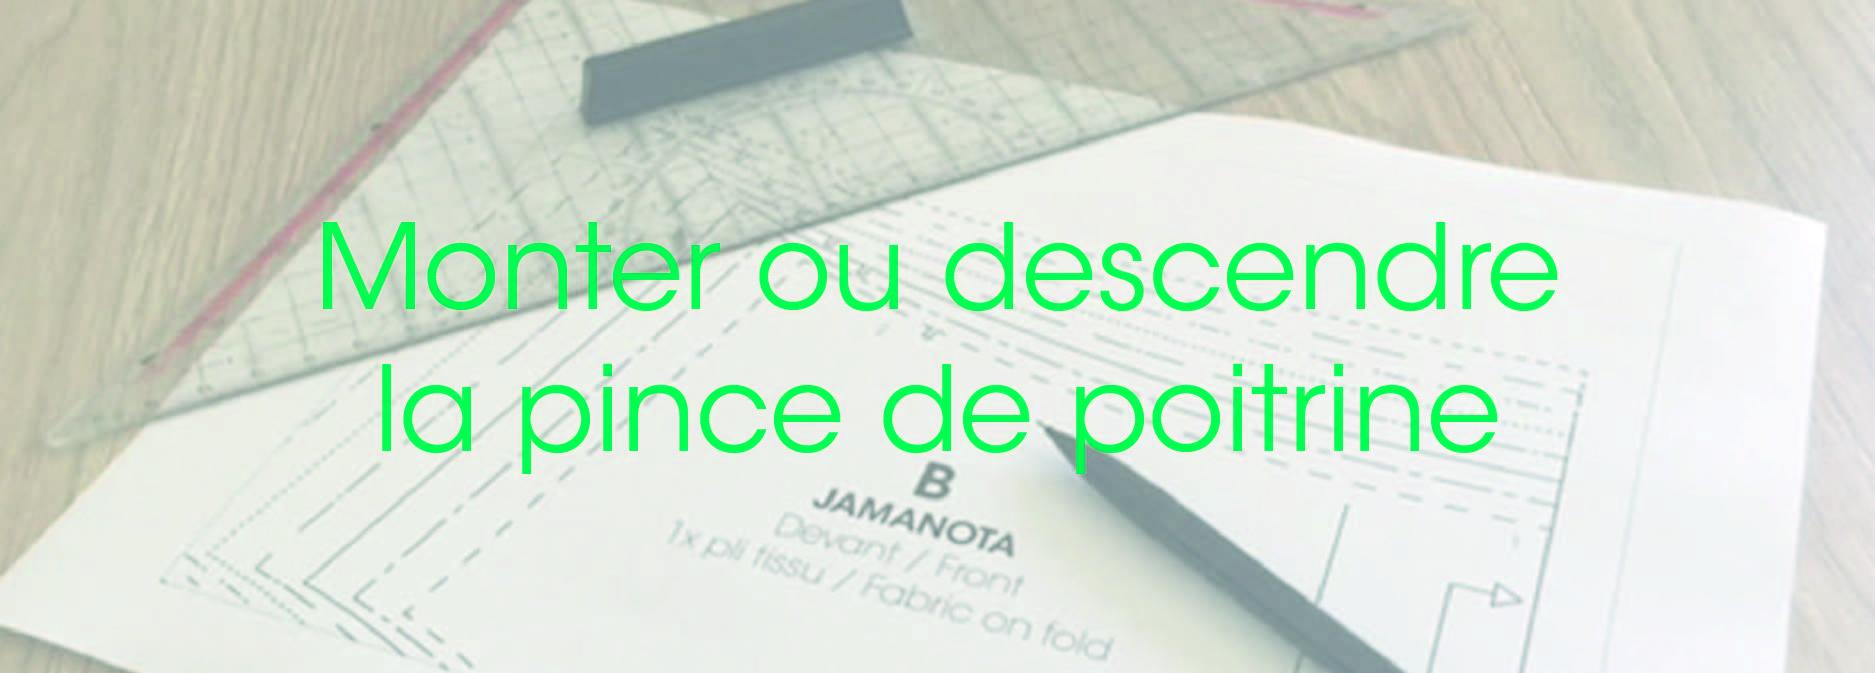 Modélisme_Monter_ou_descendre_pince_de_poitrine